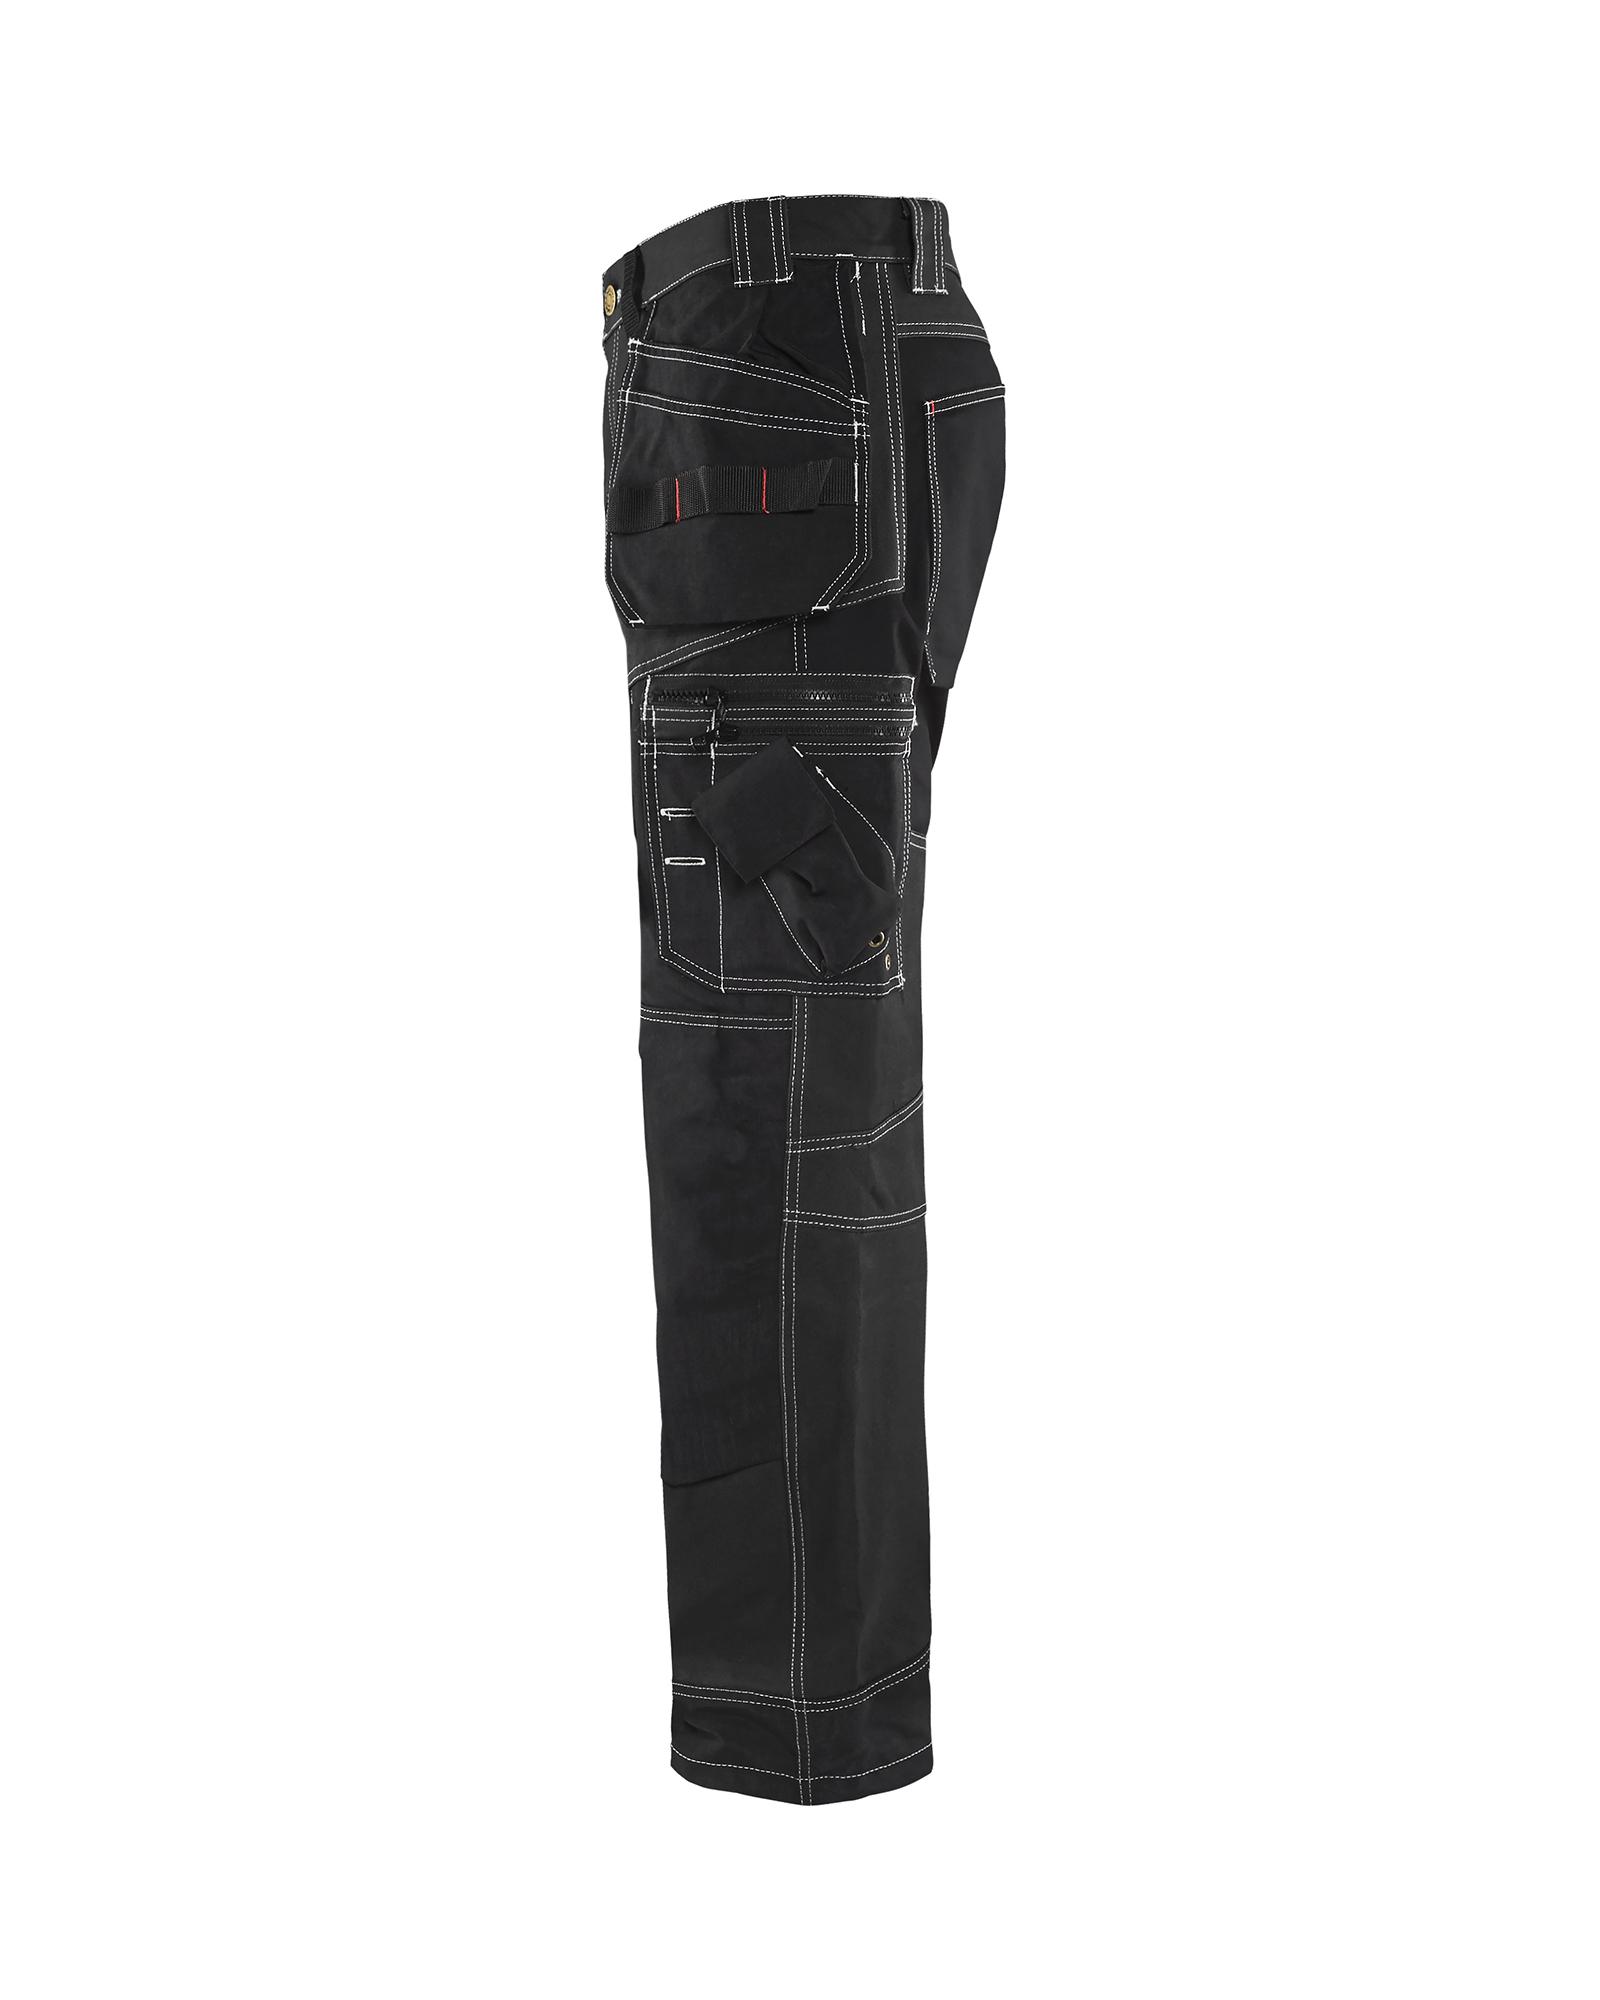 140718009900D108 TrousersProfil Size 40//30 In Black Blaklader Metric Size D108